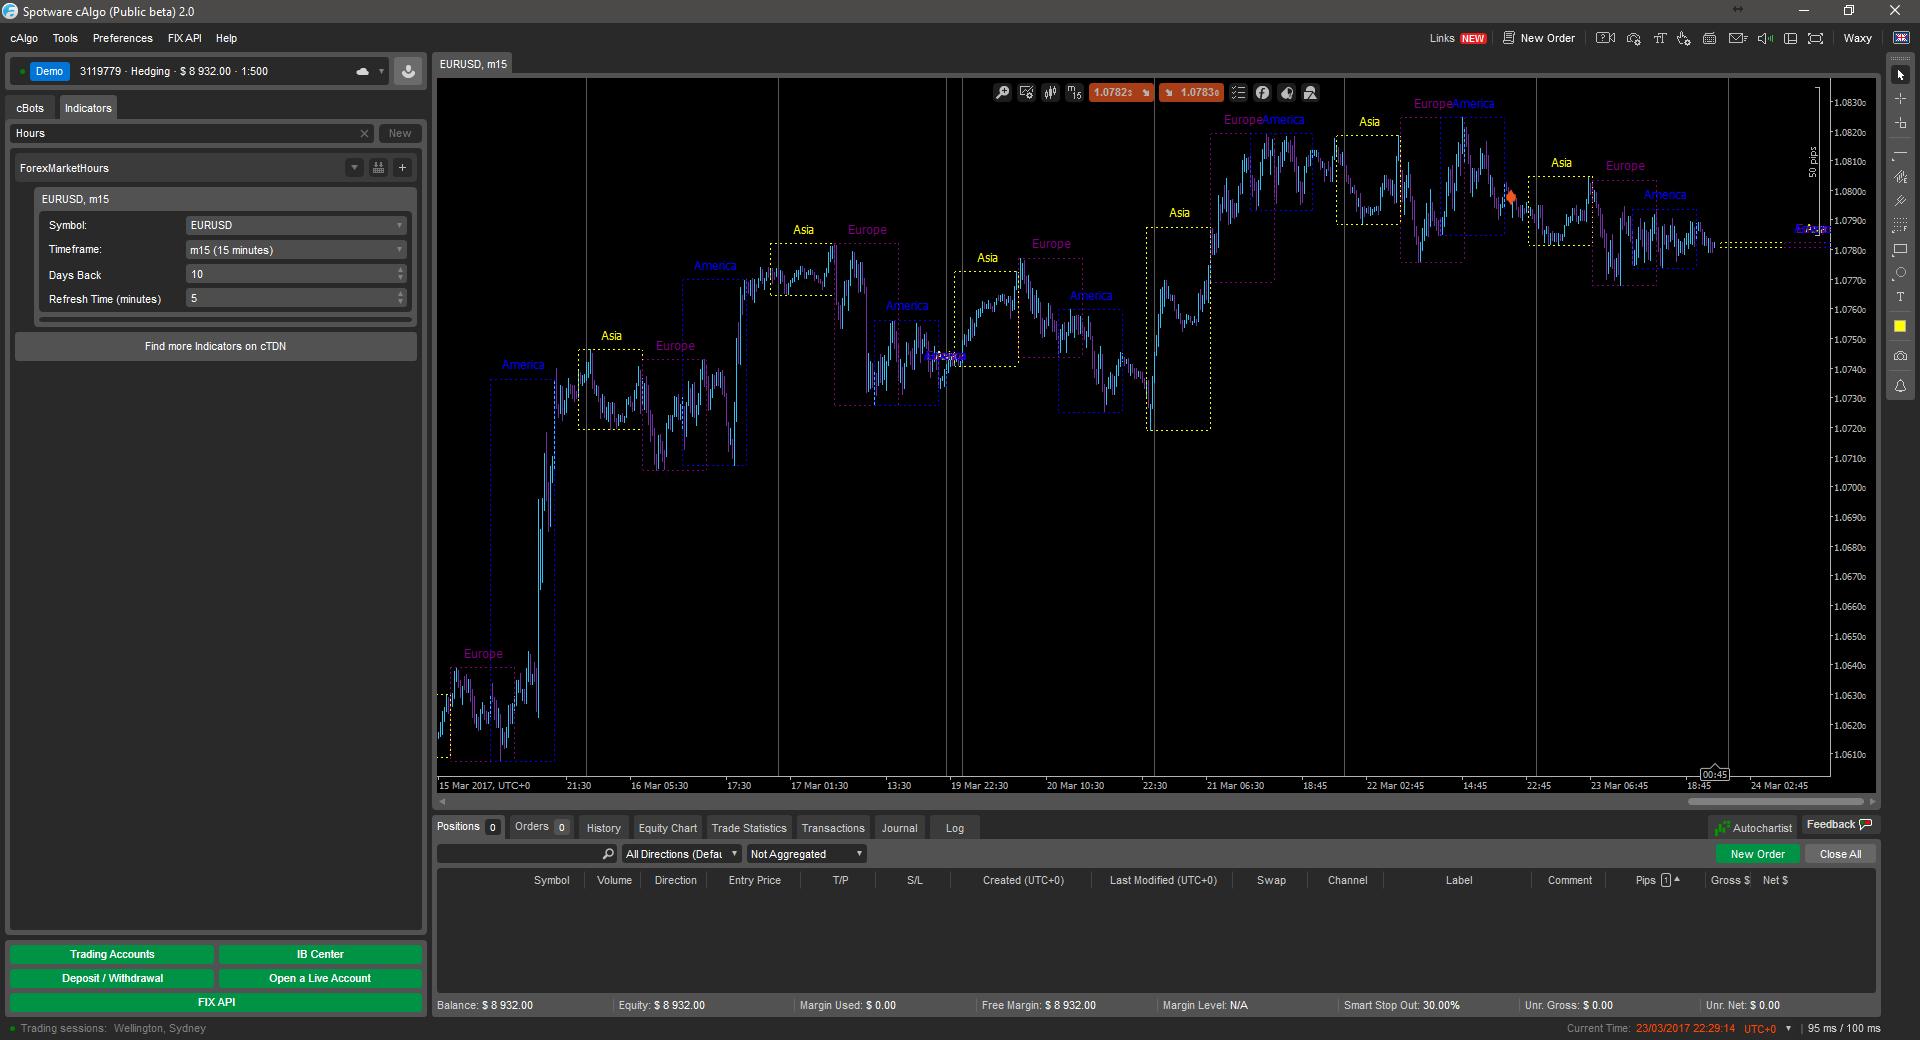 Europe forex market hours